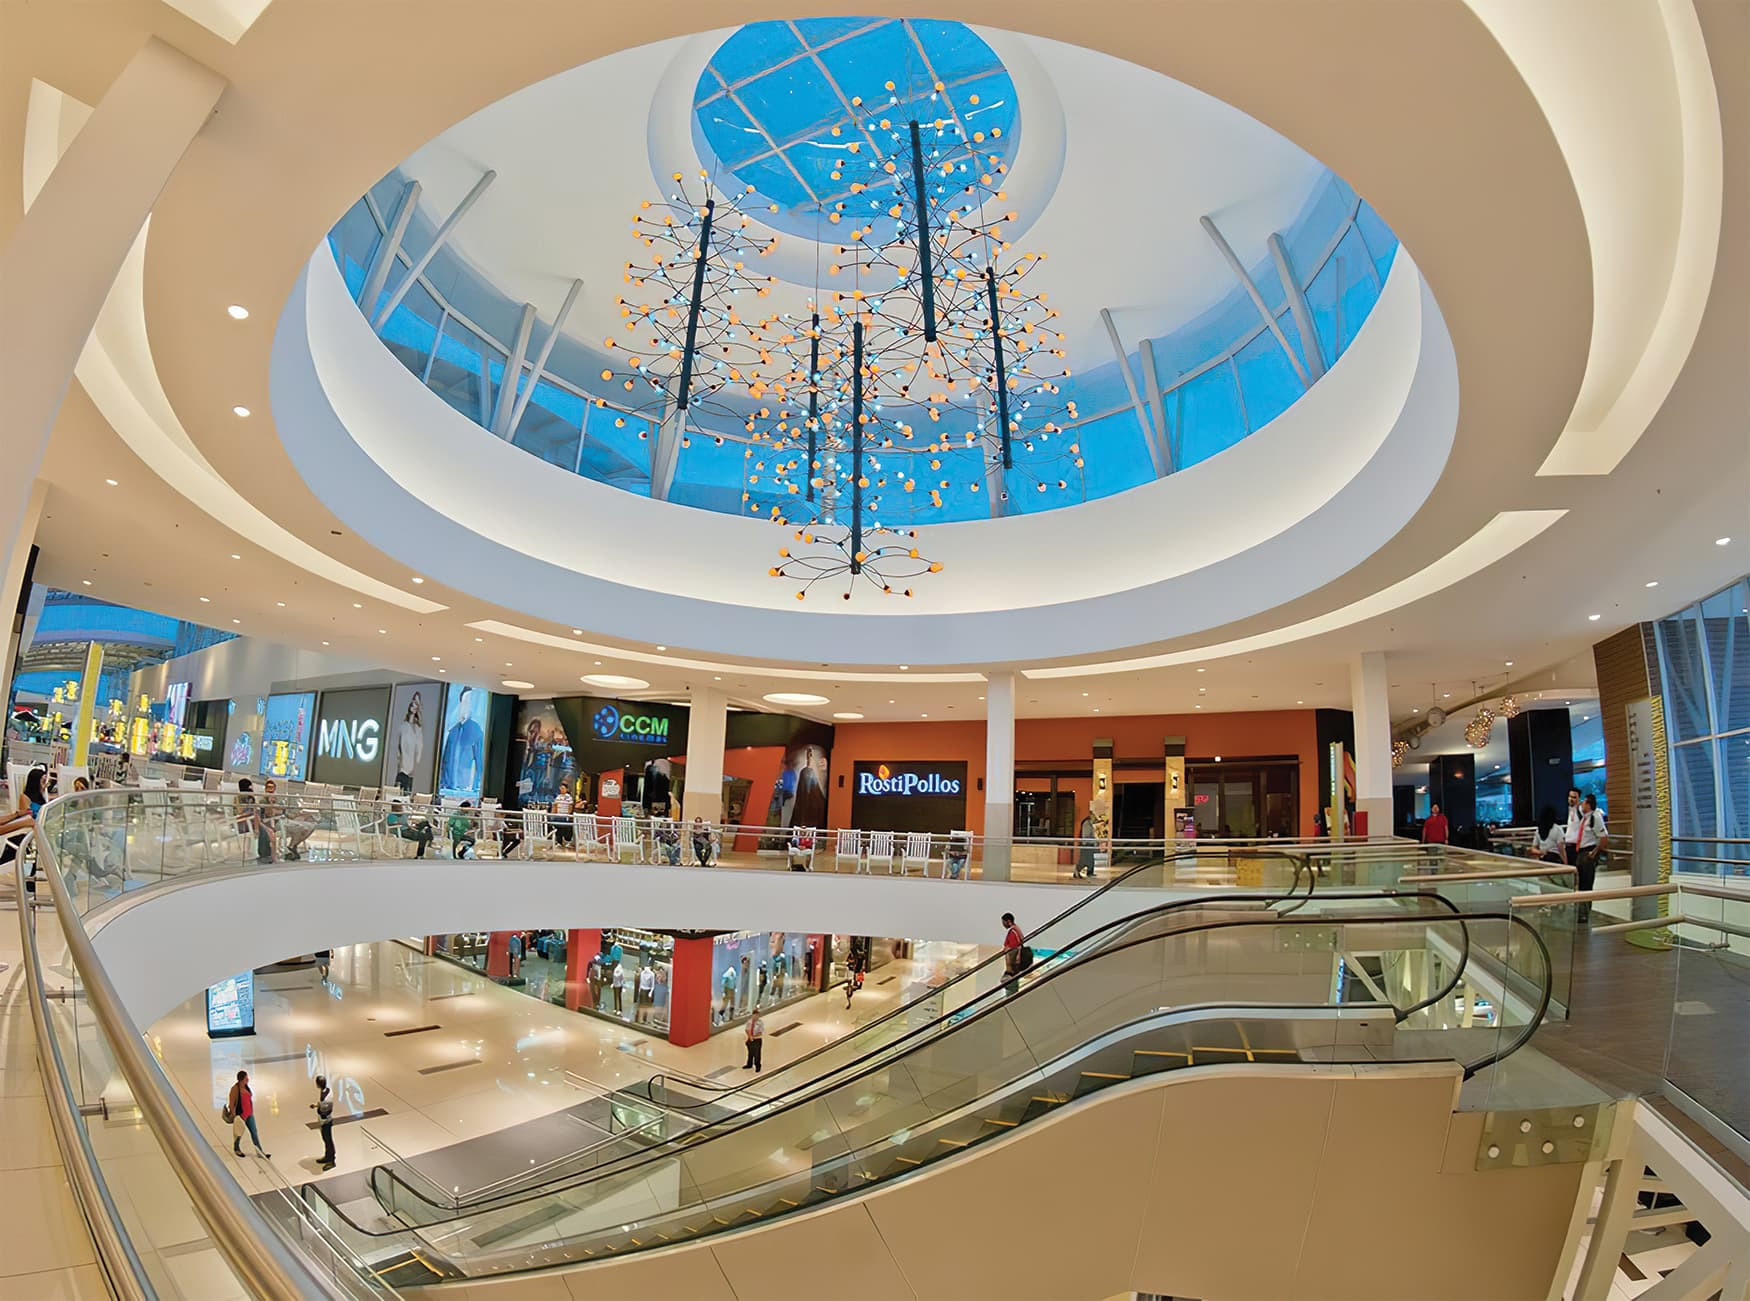 Lincoln Plaza, a retail destination in located in San Jose, Costa Rica. RSM Design brought environmental graphic design and architectural graphic design.